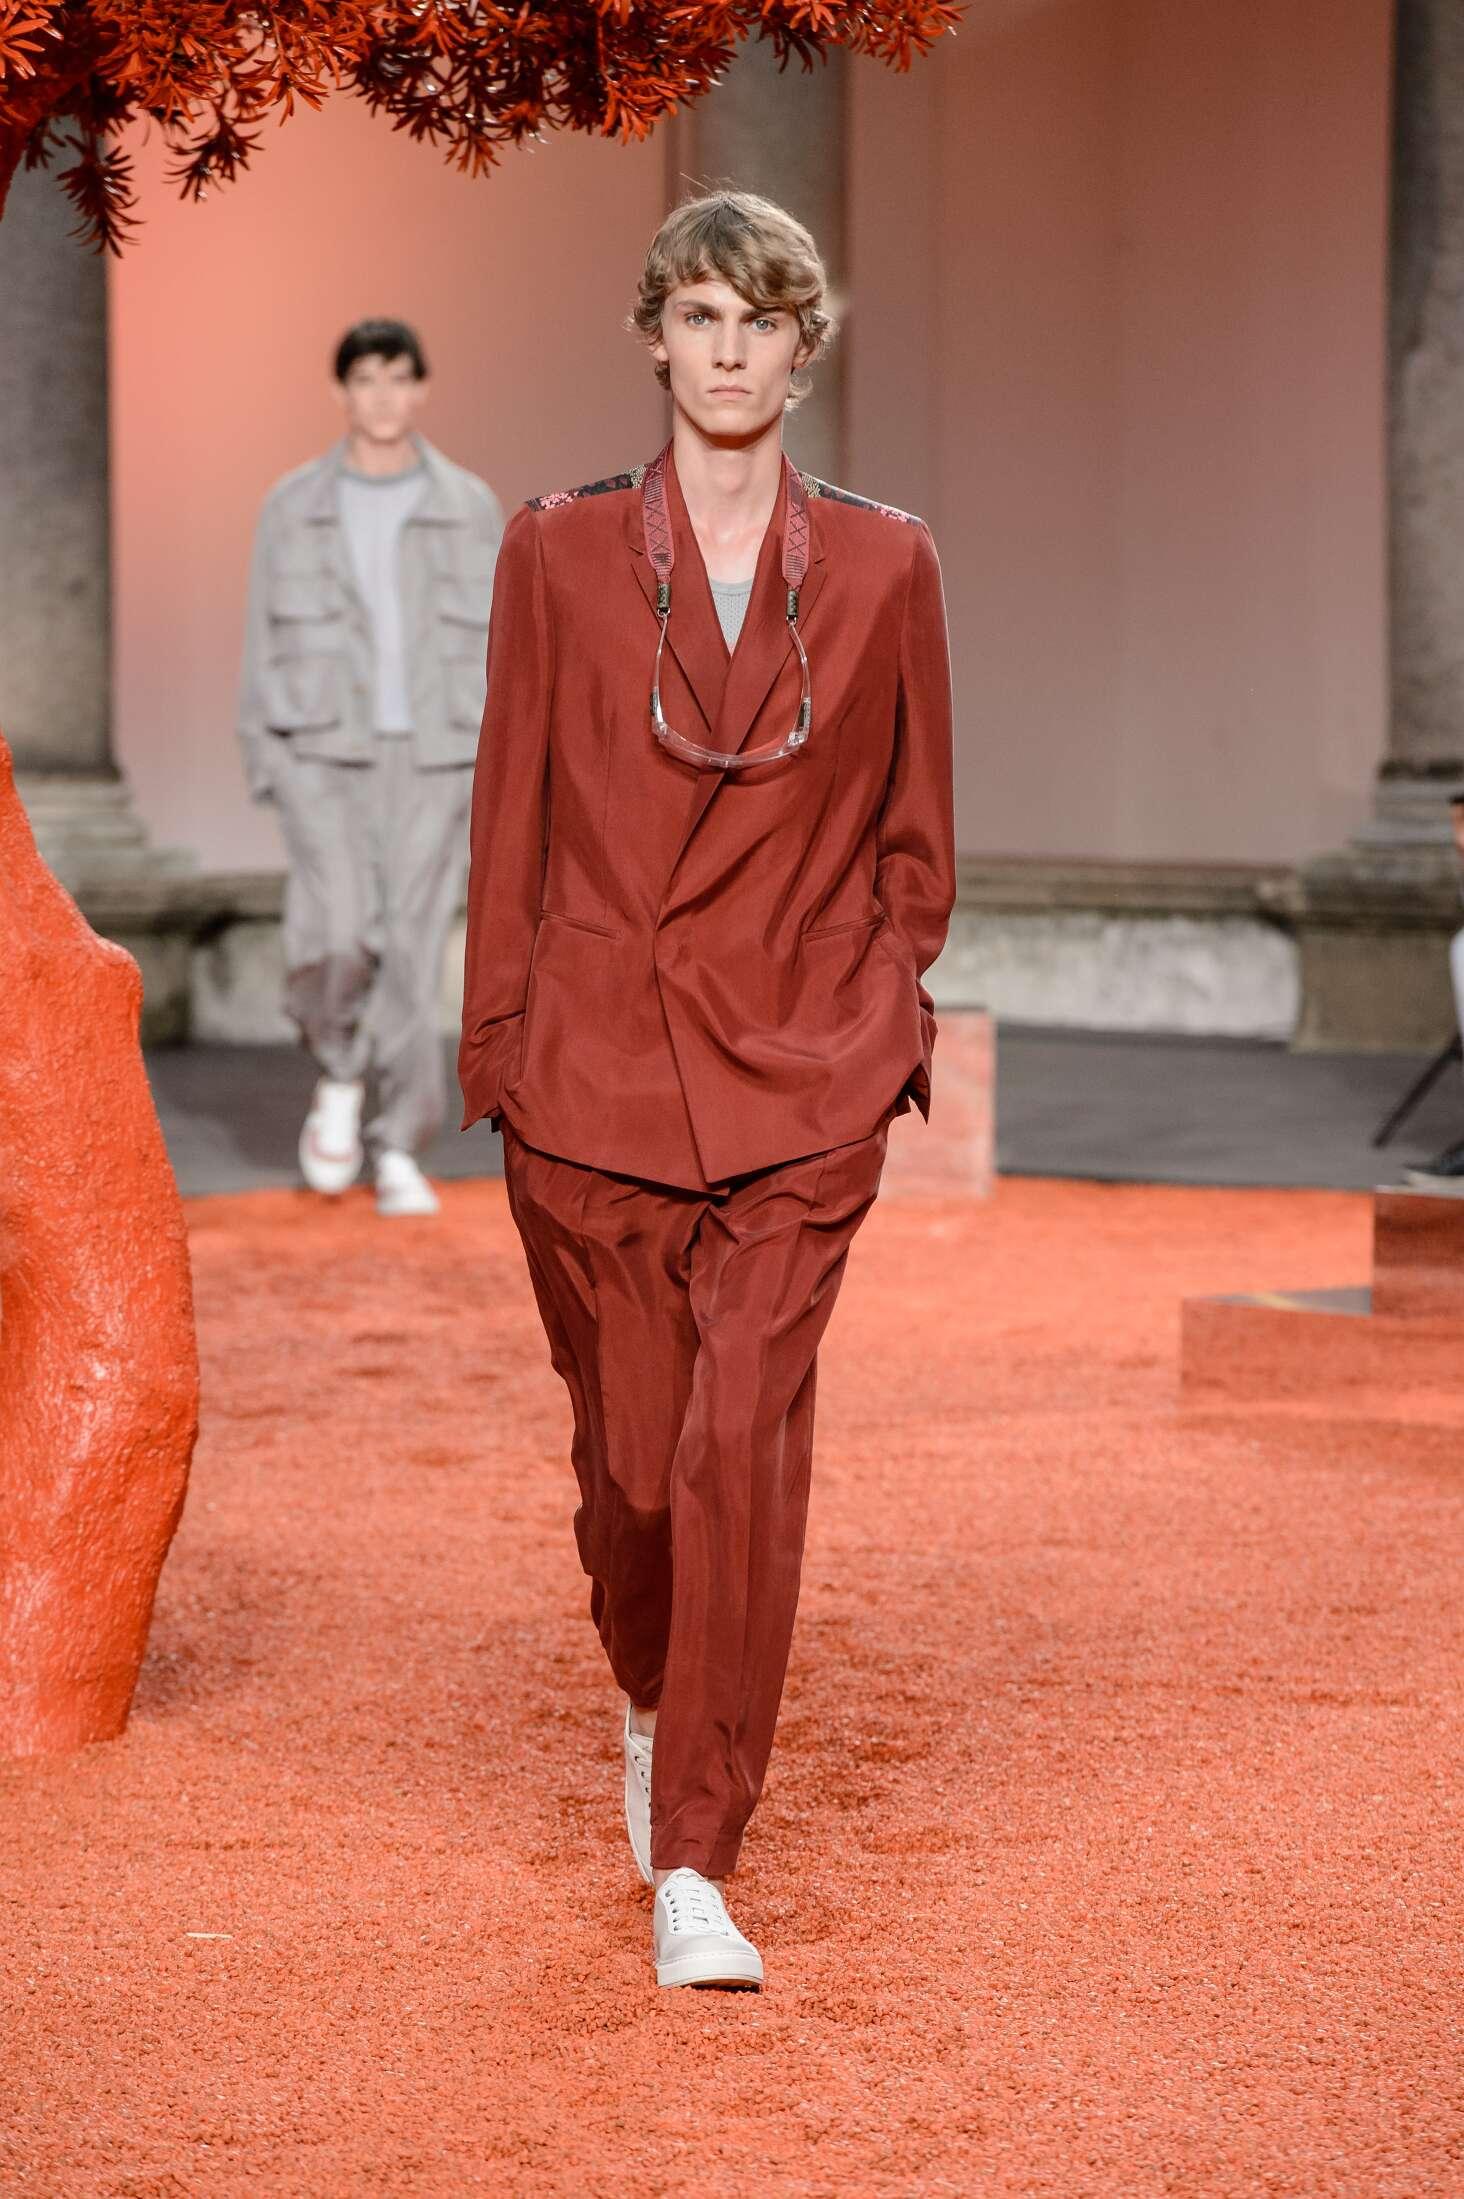 Catwalk Ermenegildo Zegna Couture Man Fashion Show Summer 2018